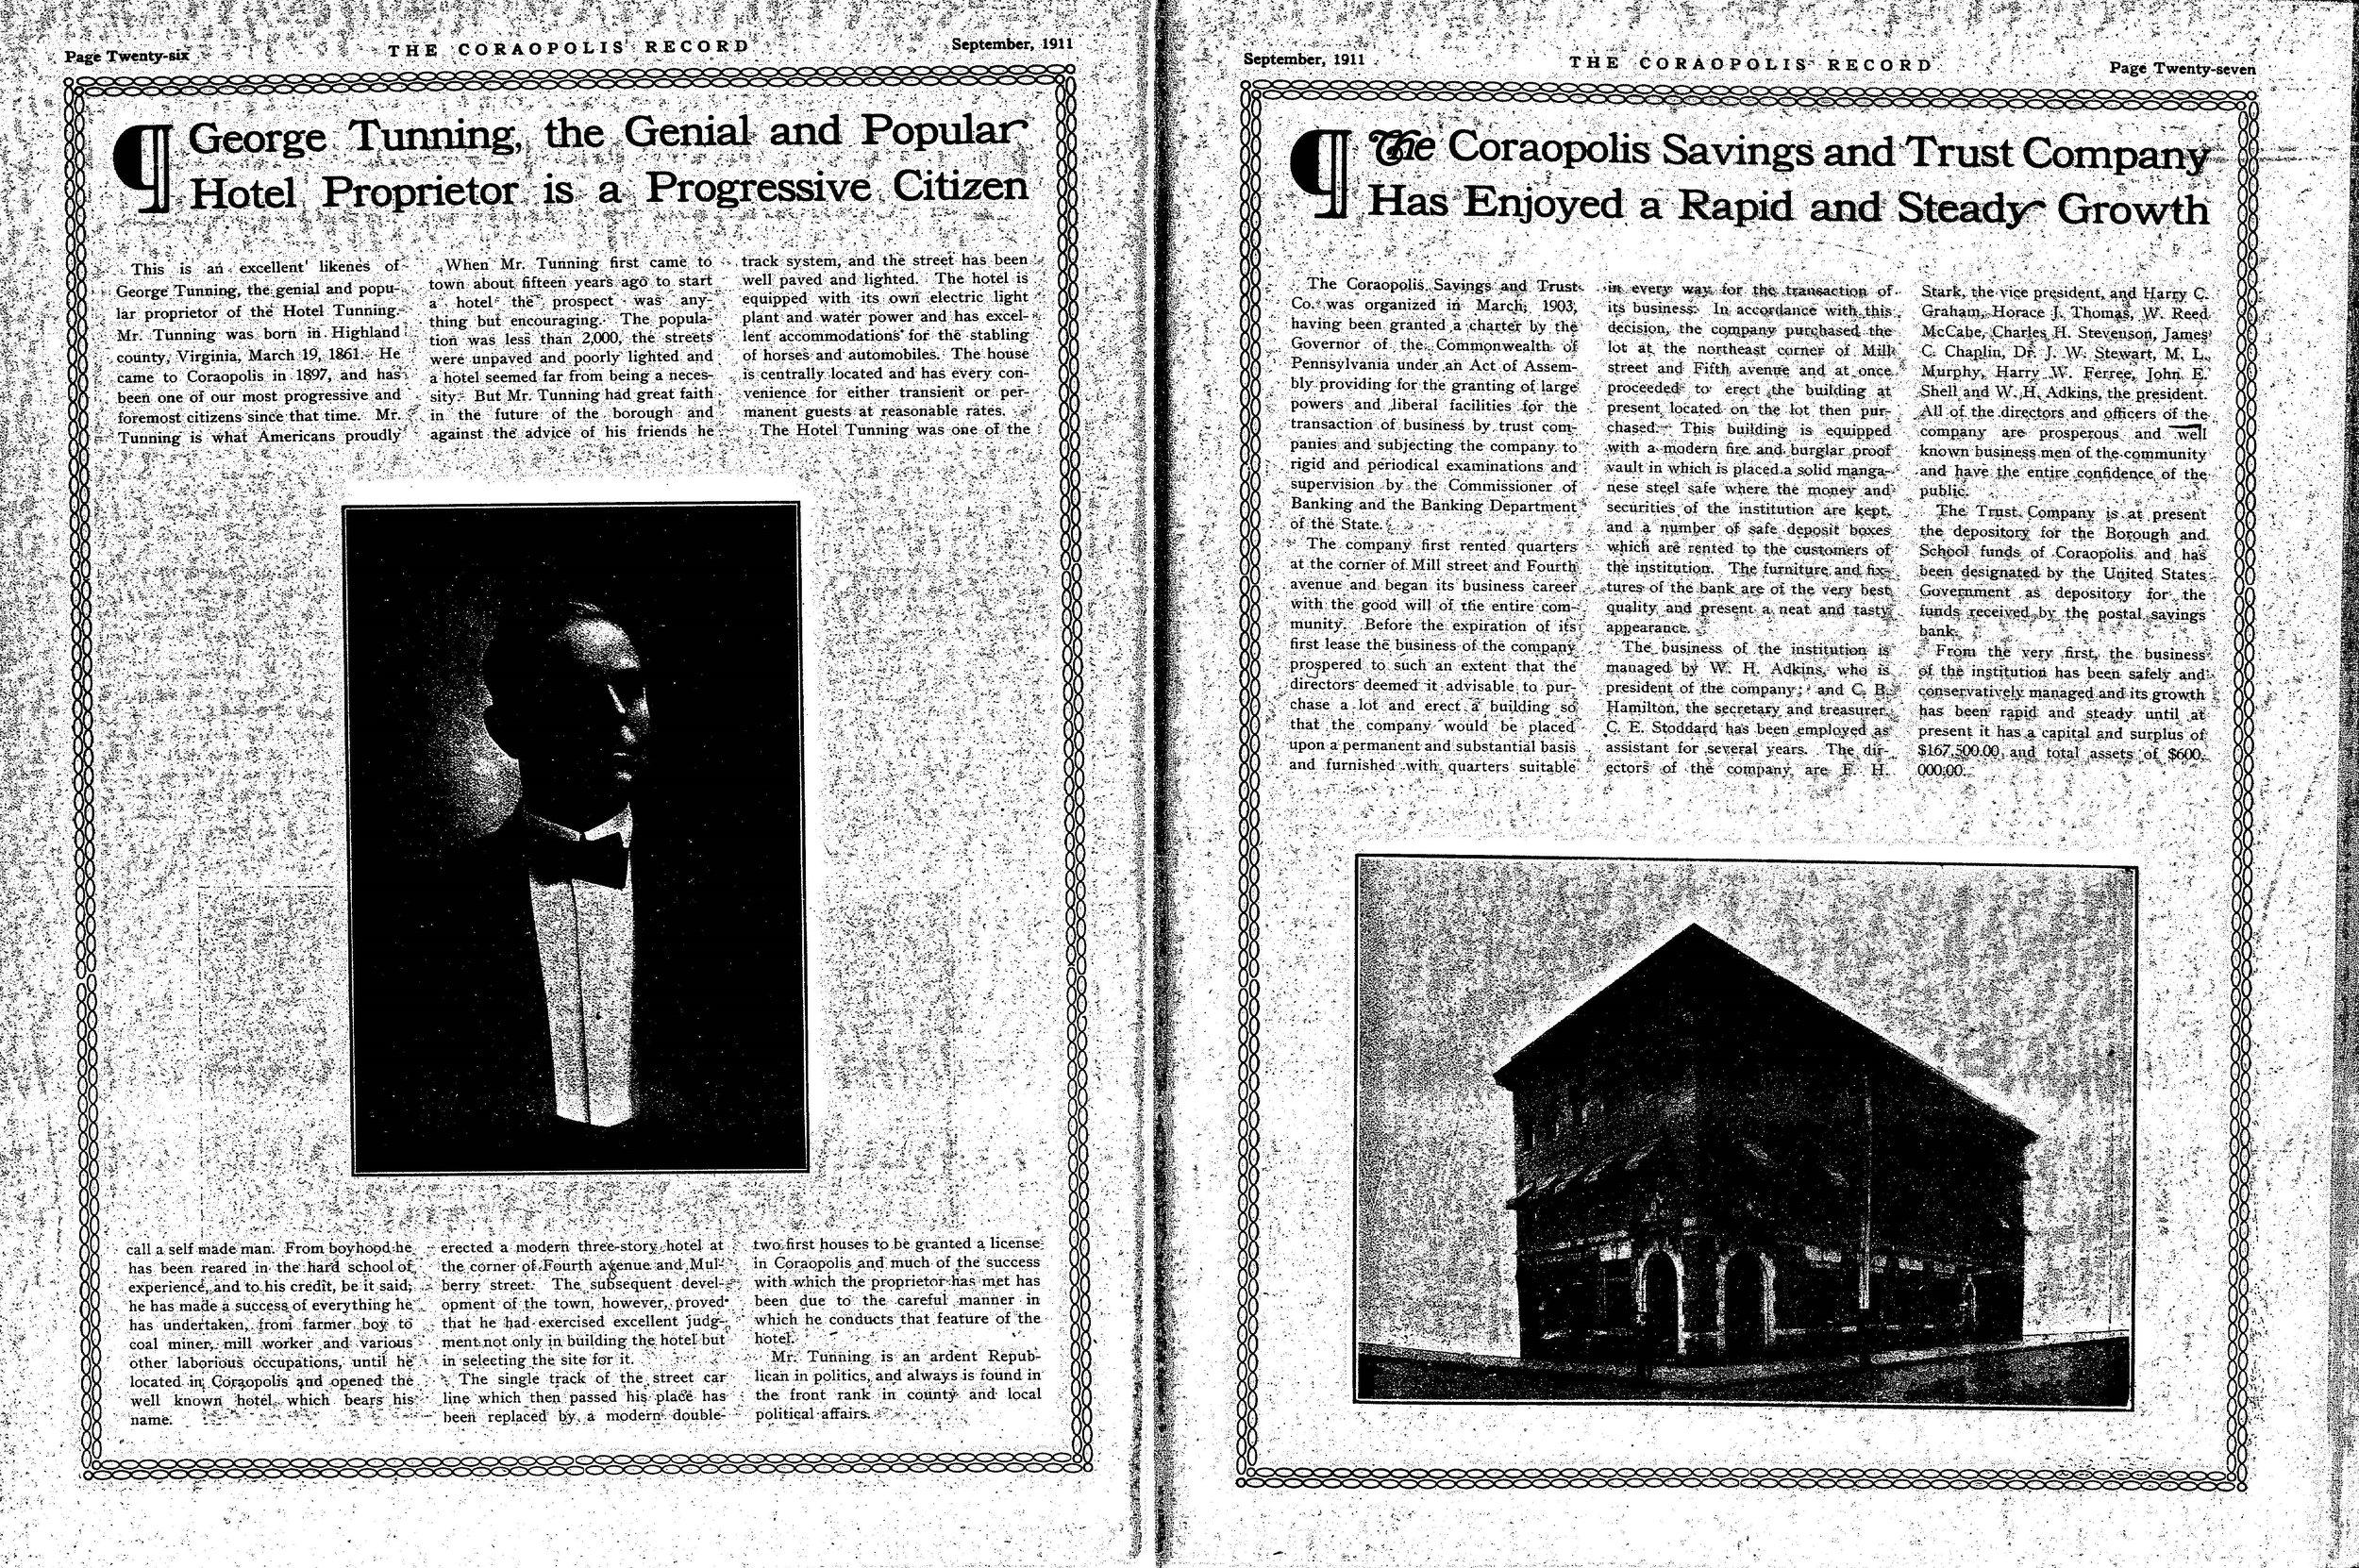 1911-09-15 The Coraopolis Record_Page_15.jpg